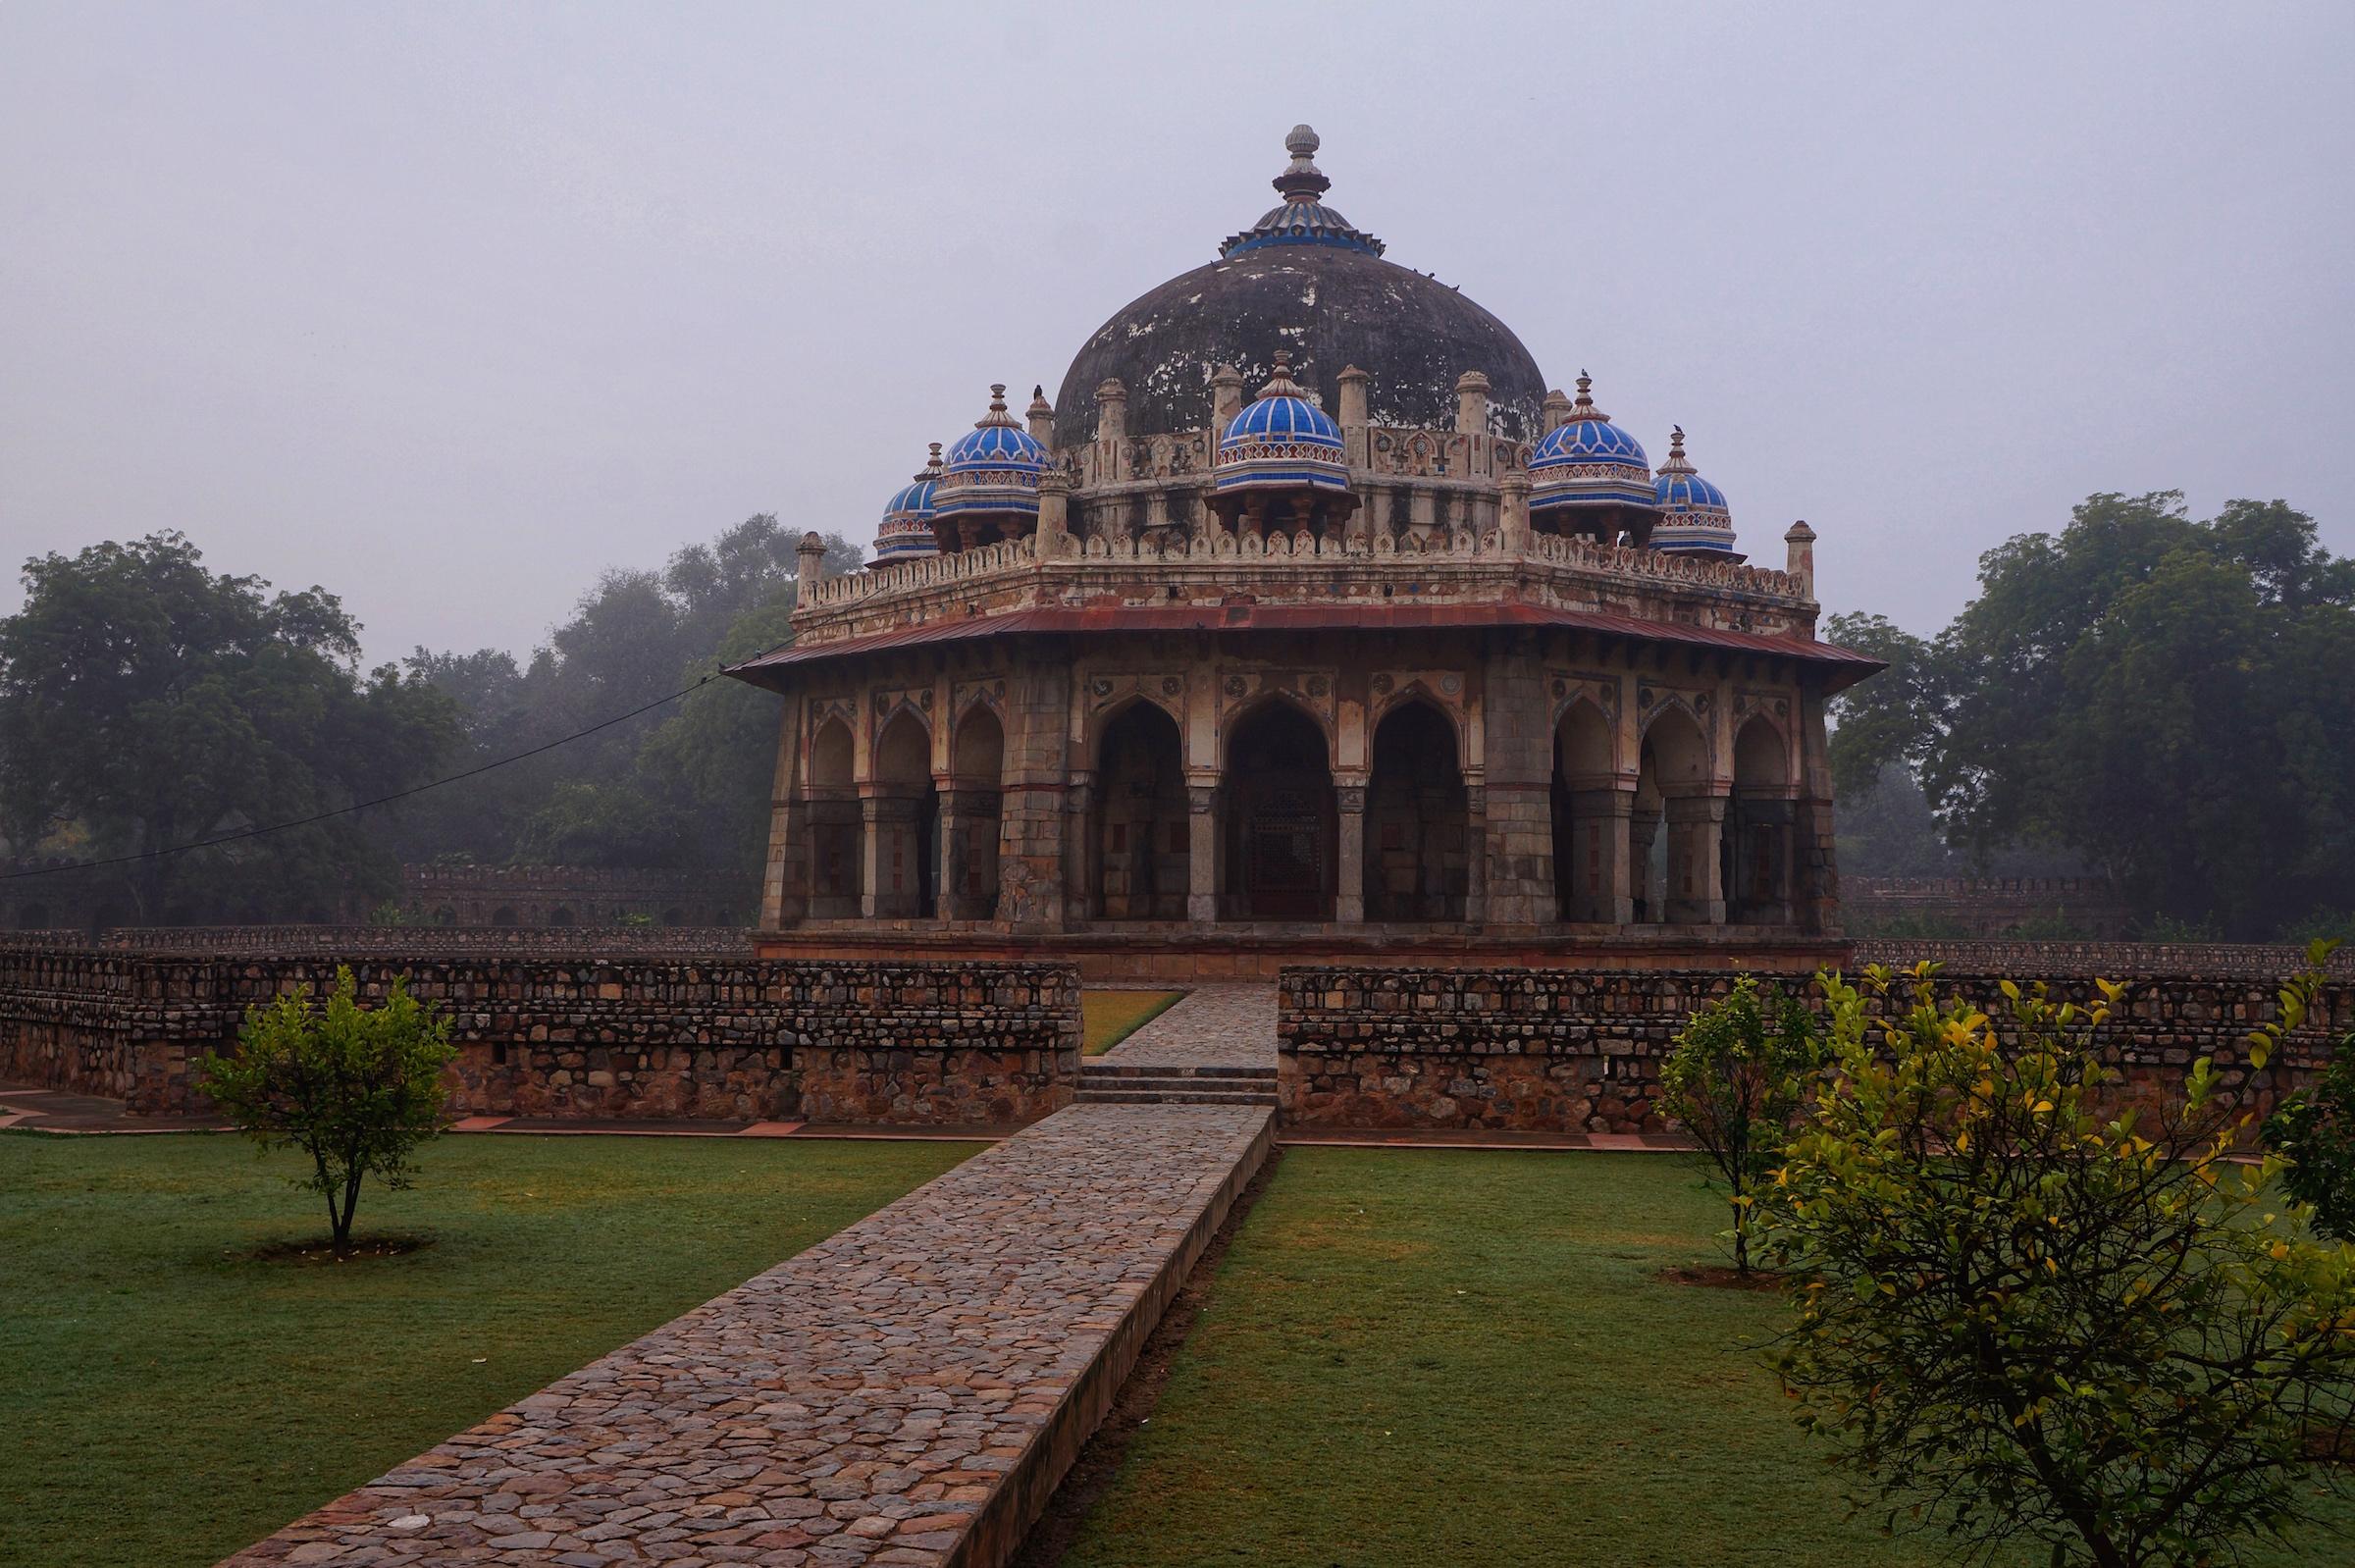 Isa Khan's Garden Tomb, part of the UNESCO World Heritage Site of Humayun's Tomb.